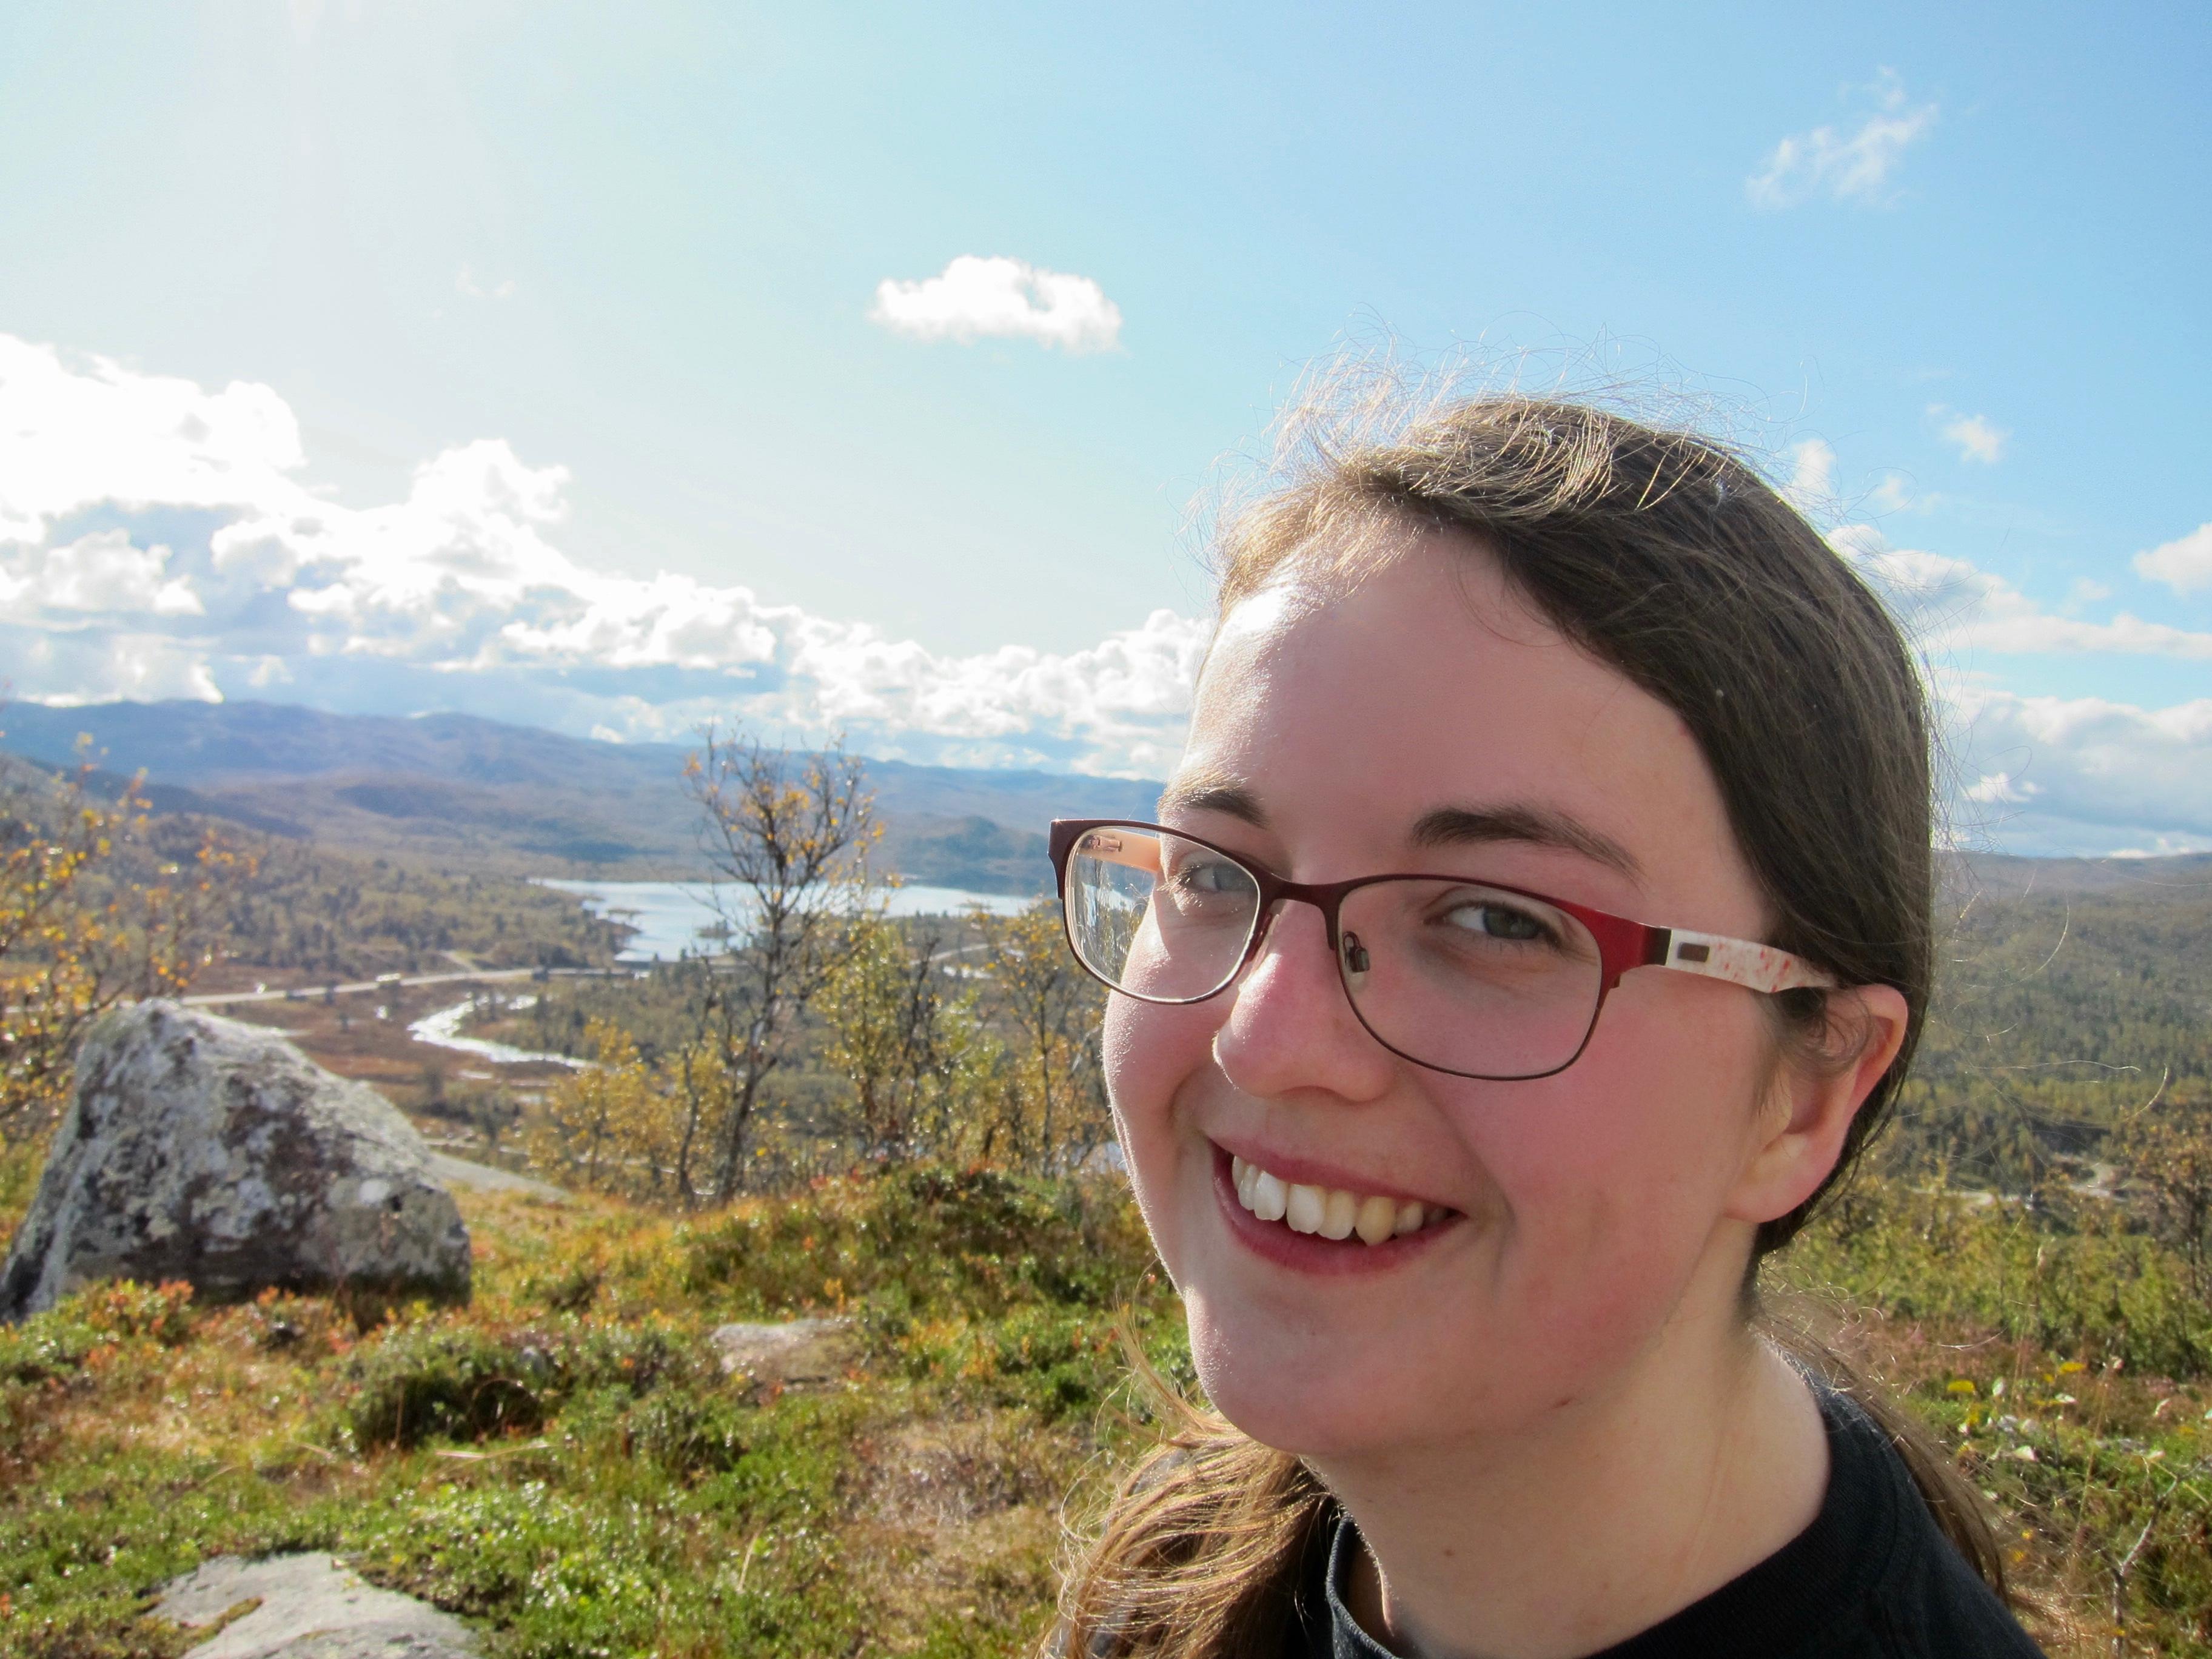 Månedens Kompis: Marta Sofie Norheim Tvetene